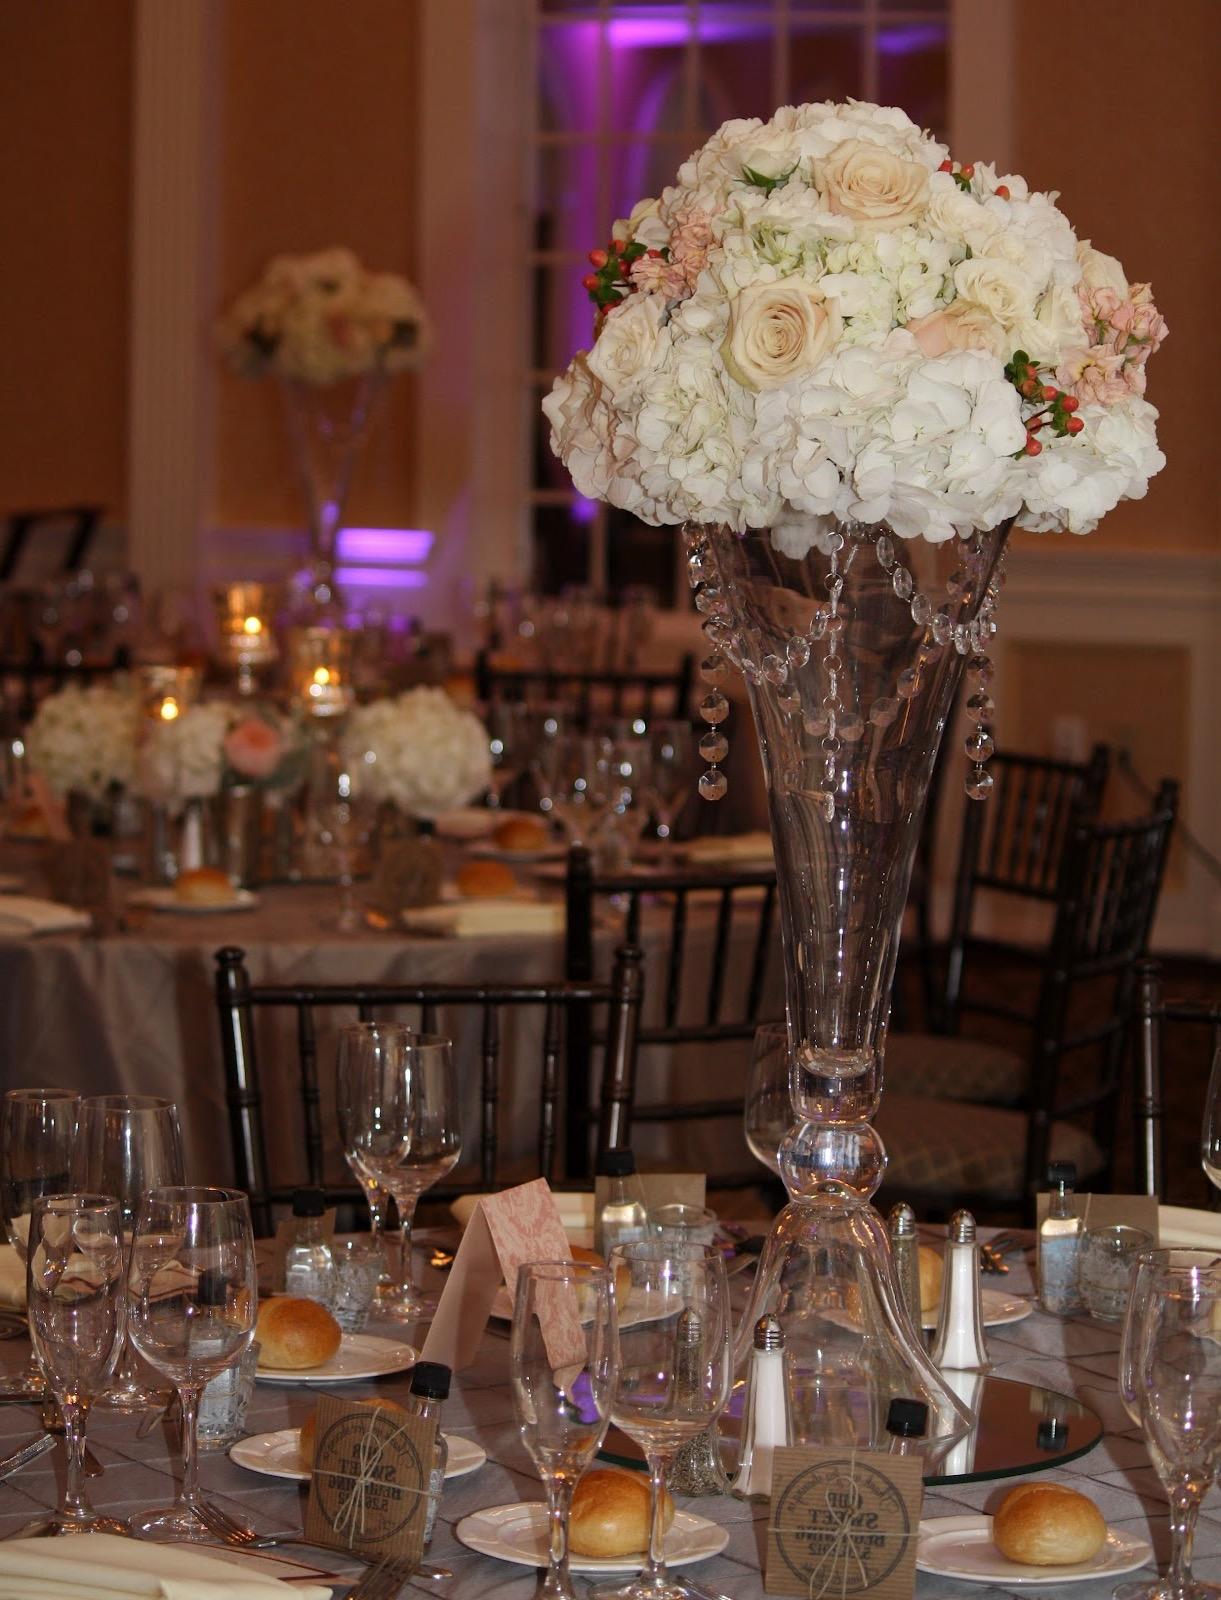 Dramatic tall wedding centerpieces